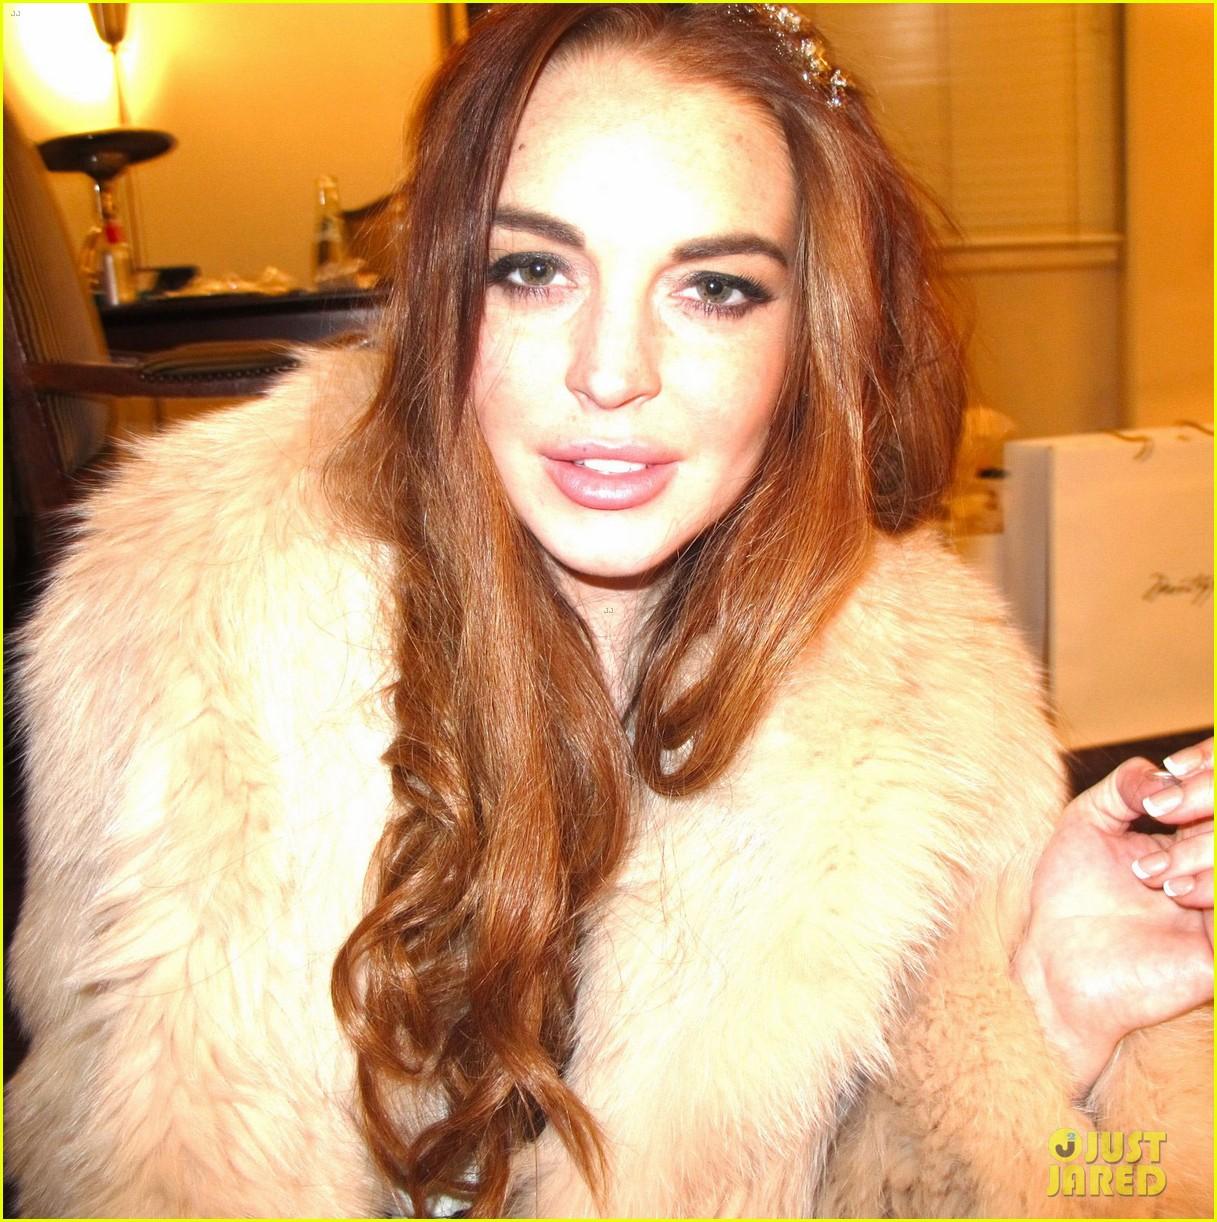 Watch PICS: Lady Gaga and Lindsay Lohan's Chateau Marmont sleepover video